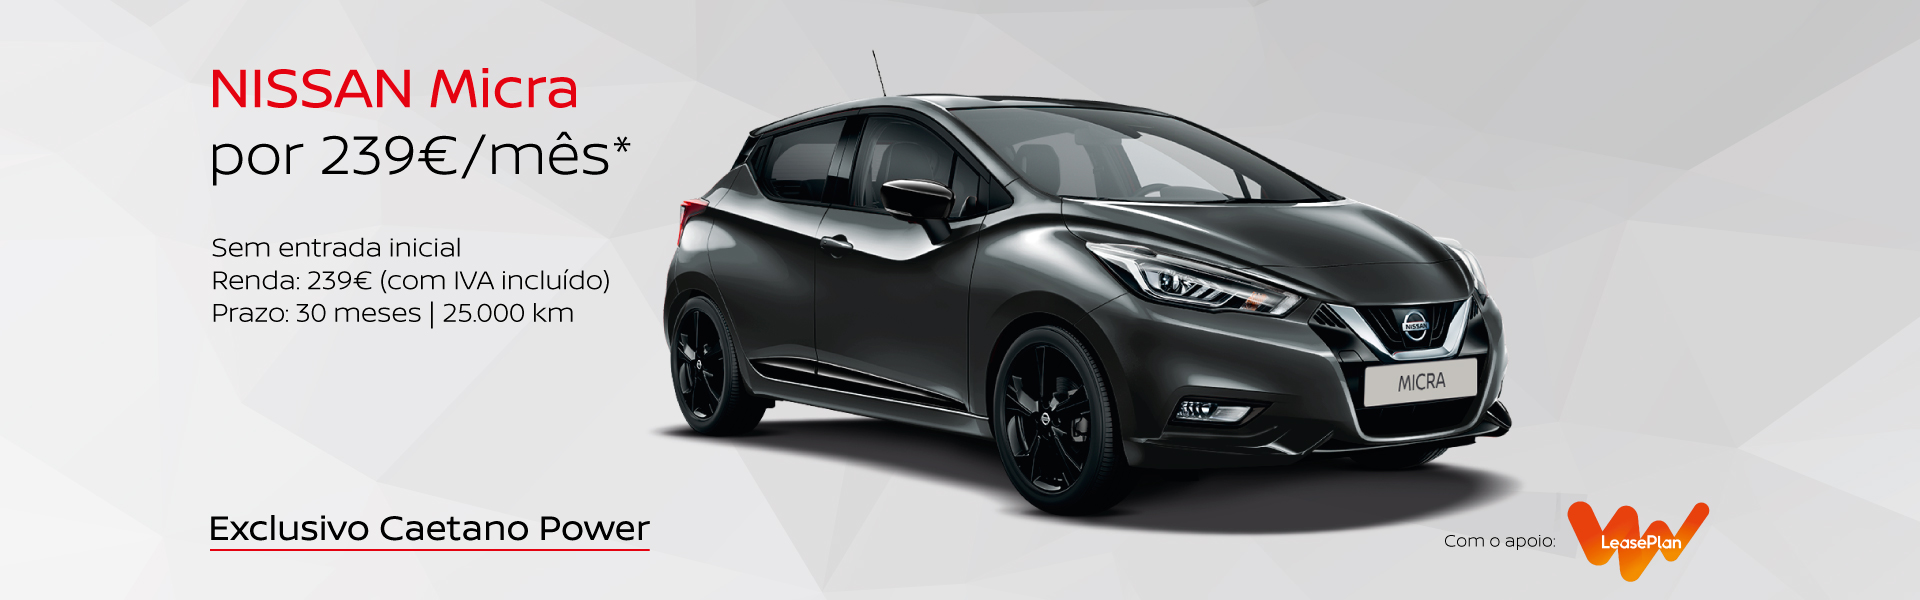 ofertas do Nissan Micra